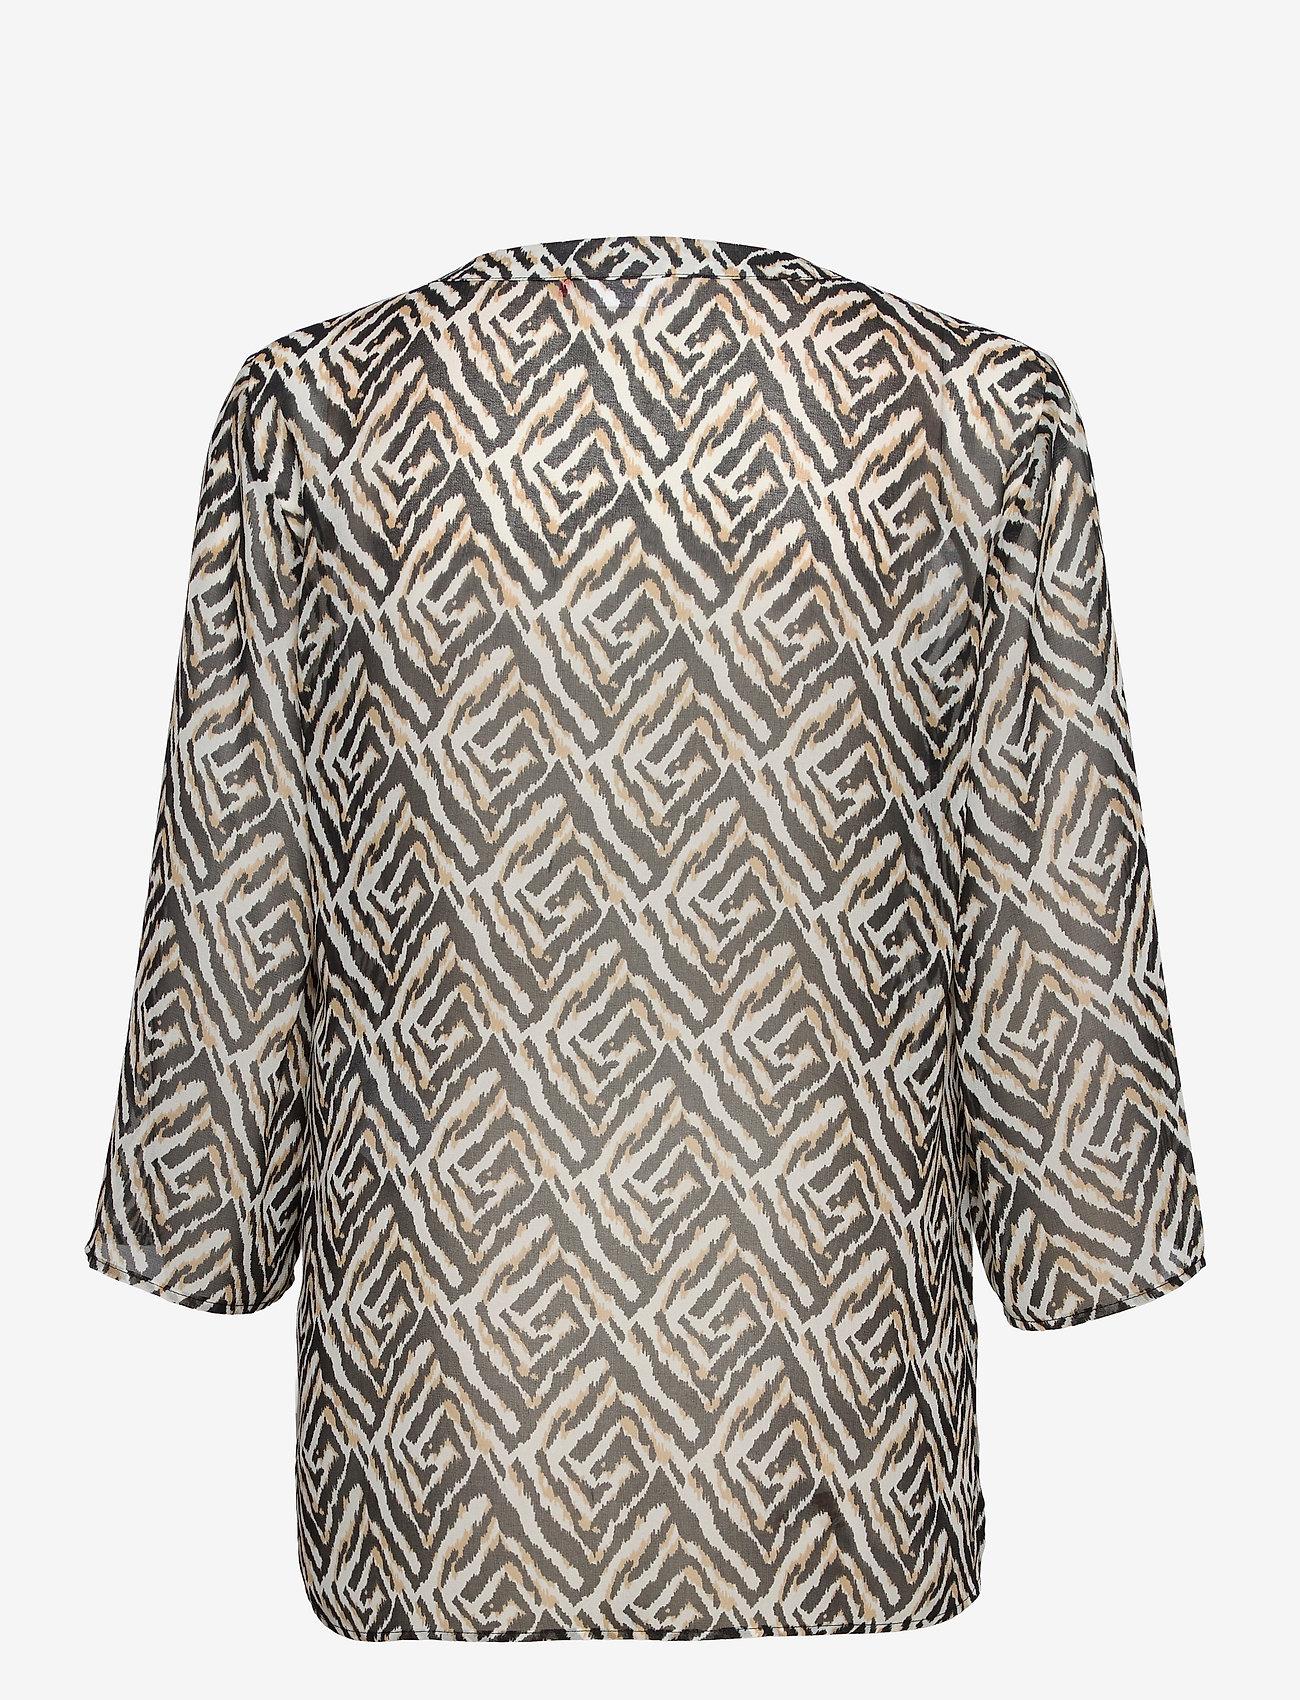 Gerry Weber - BLOUSE 3/4-SLEEVE - blouses à manches longues - ecru black sahara print - 1